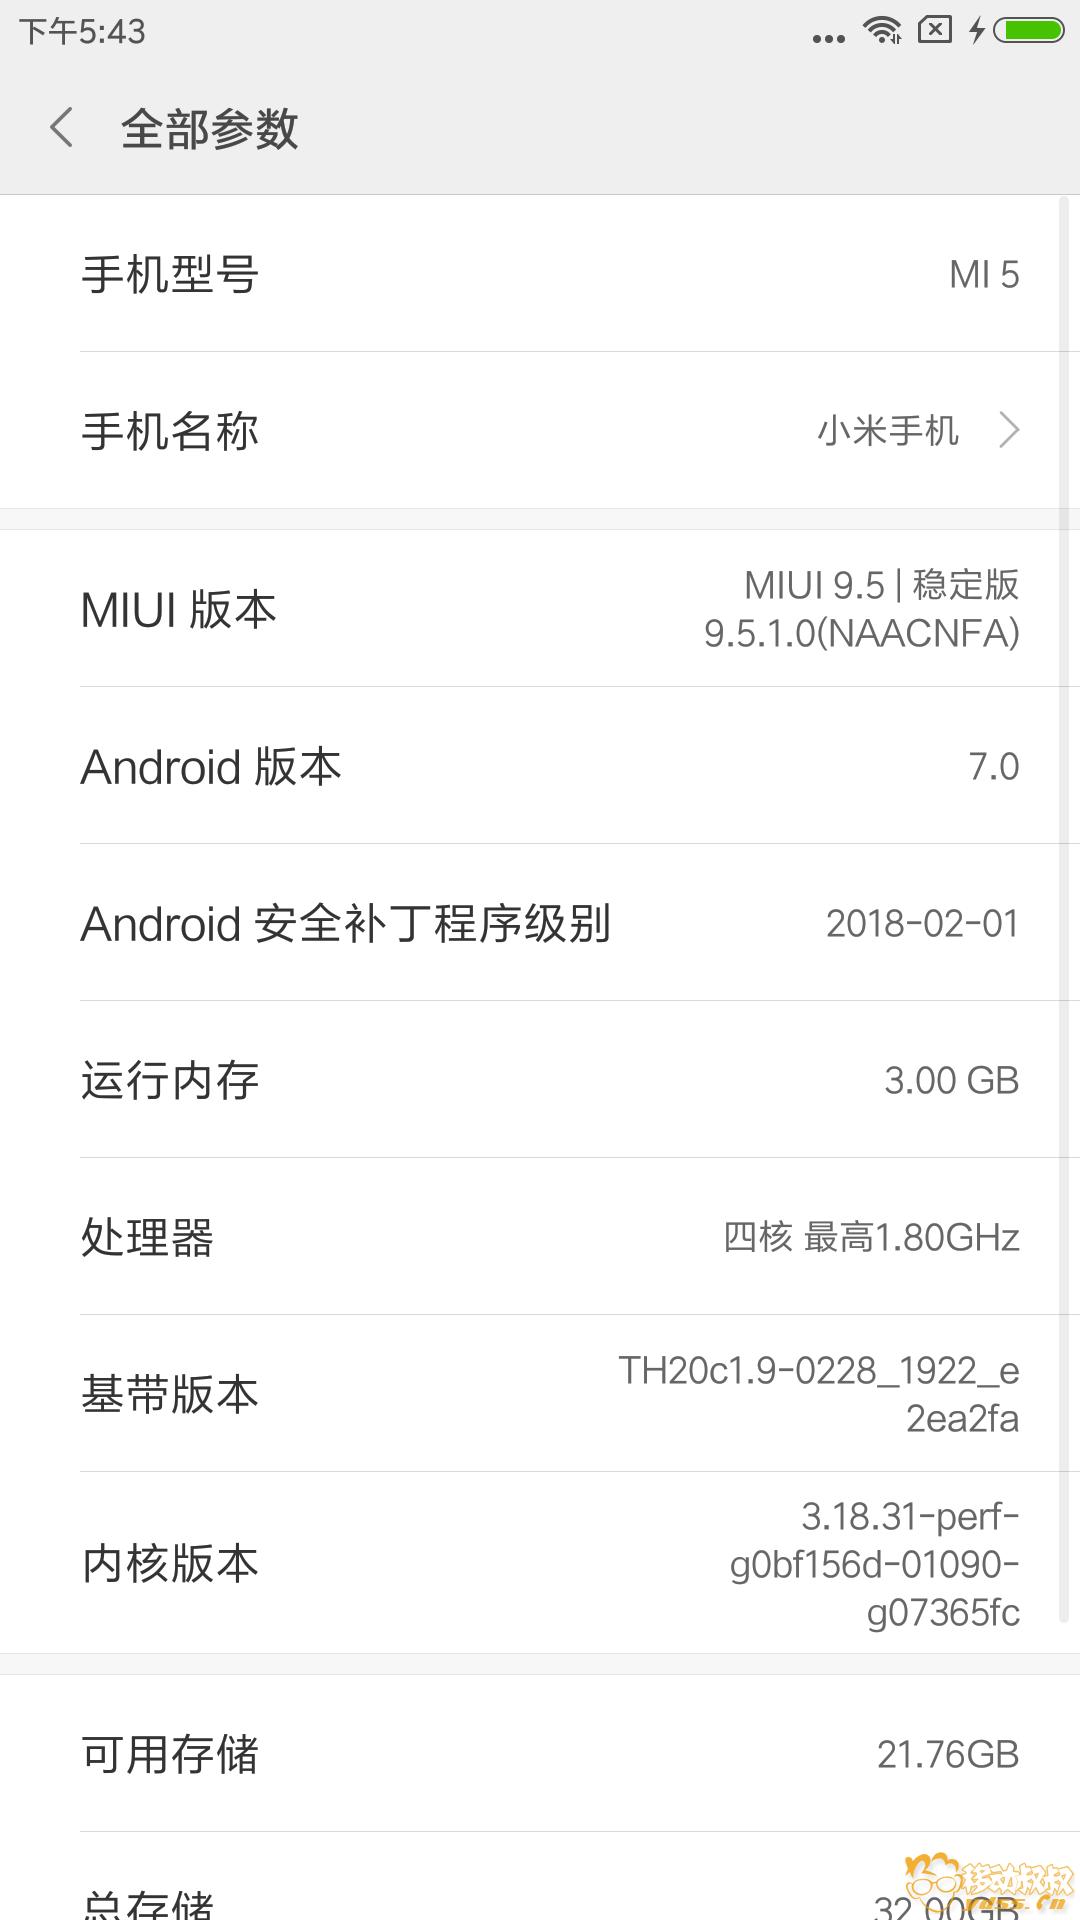 Screenshot_2018-03-23-17-43-51-174_com.android.settings.png